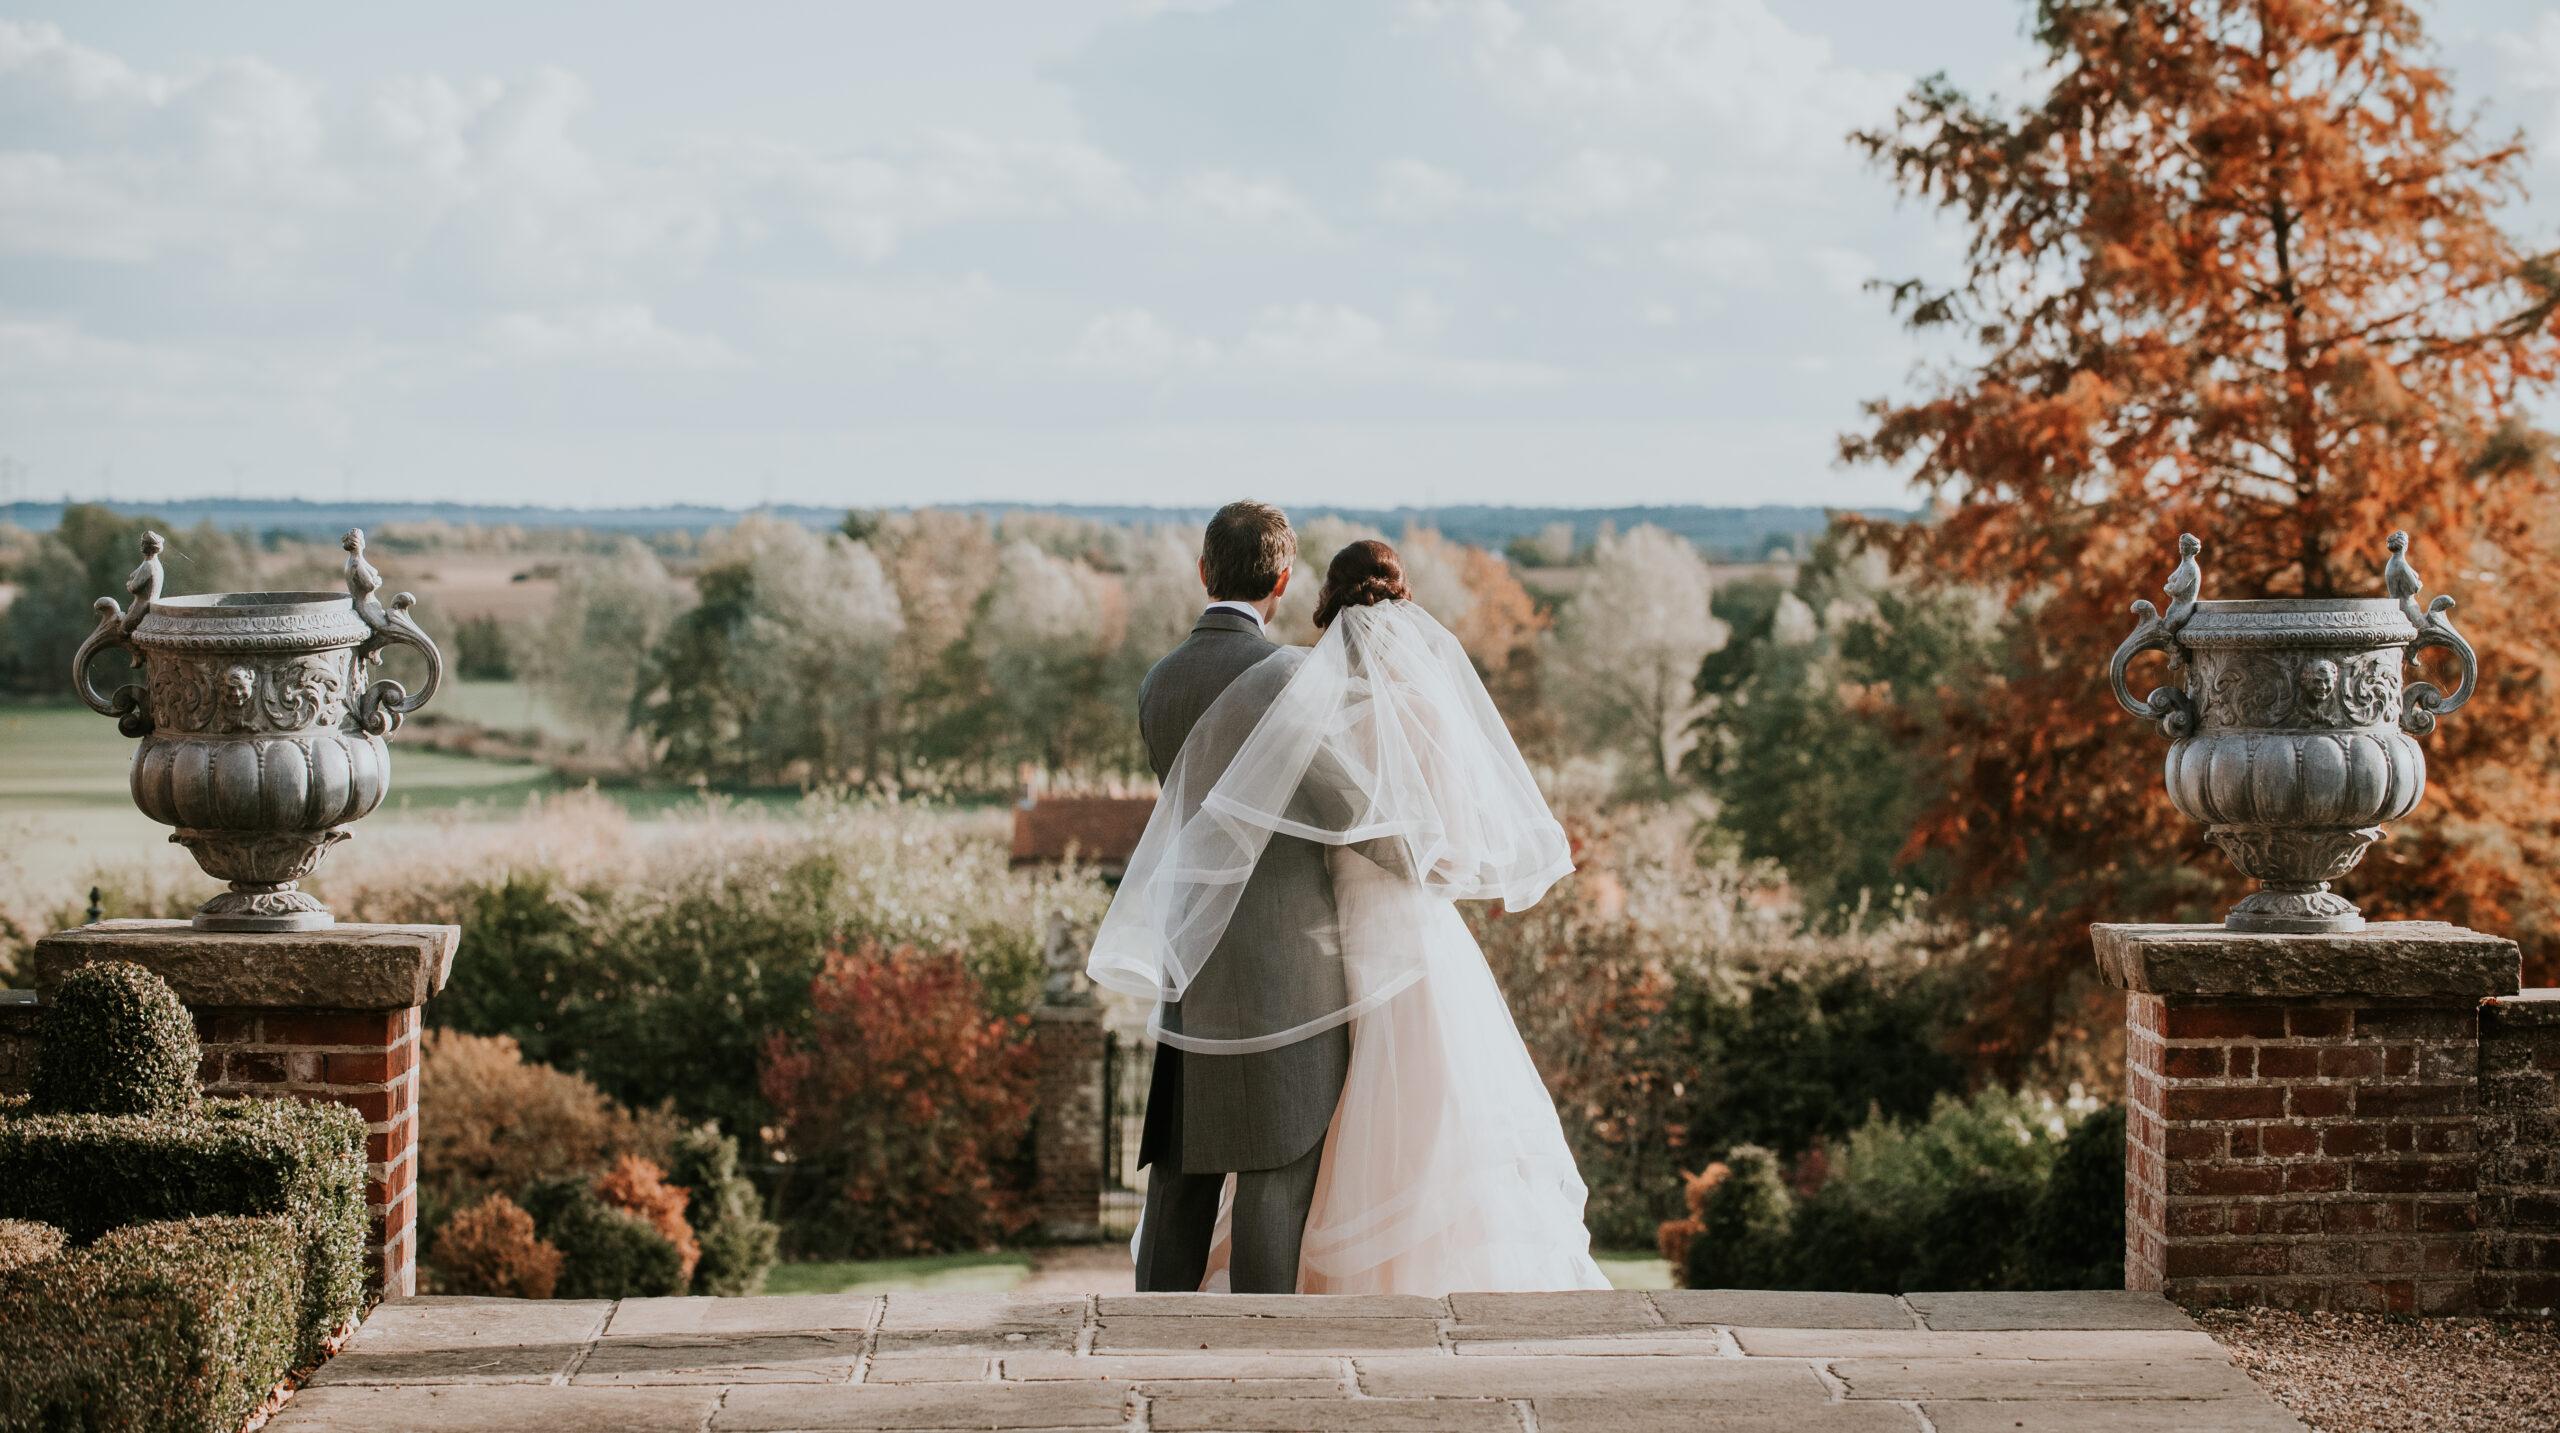 Autumn foliage, October wedding